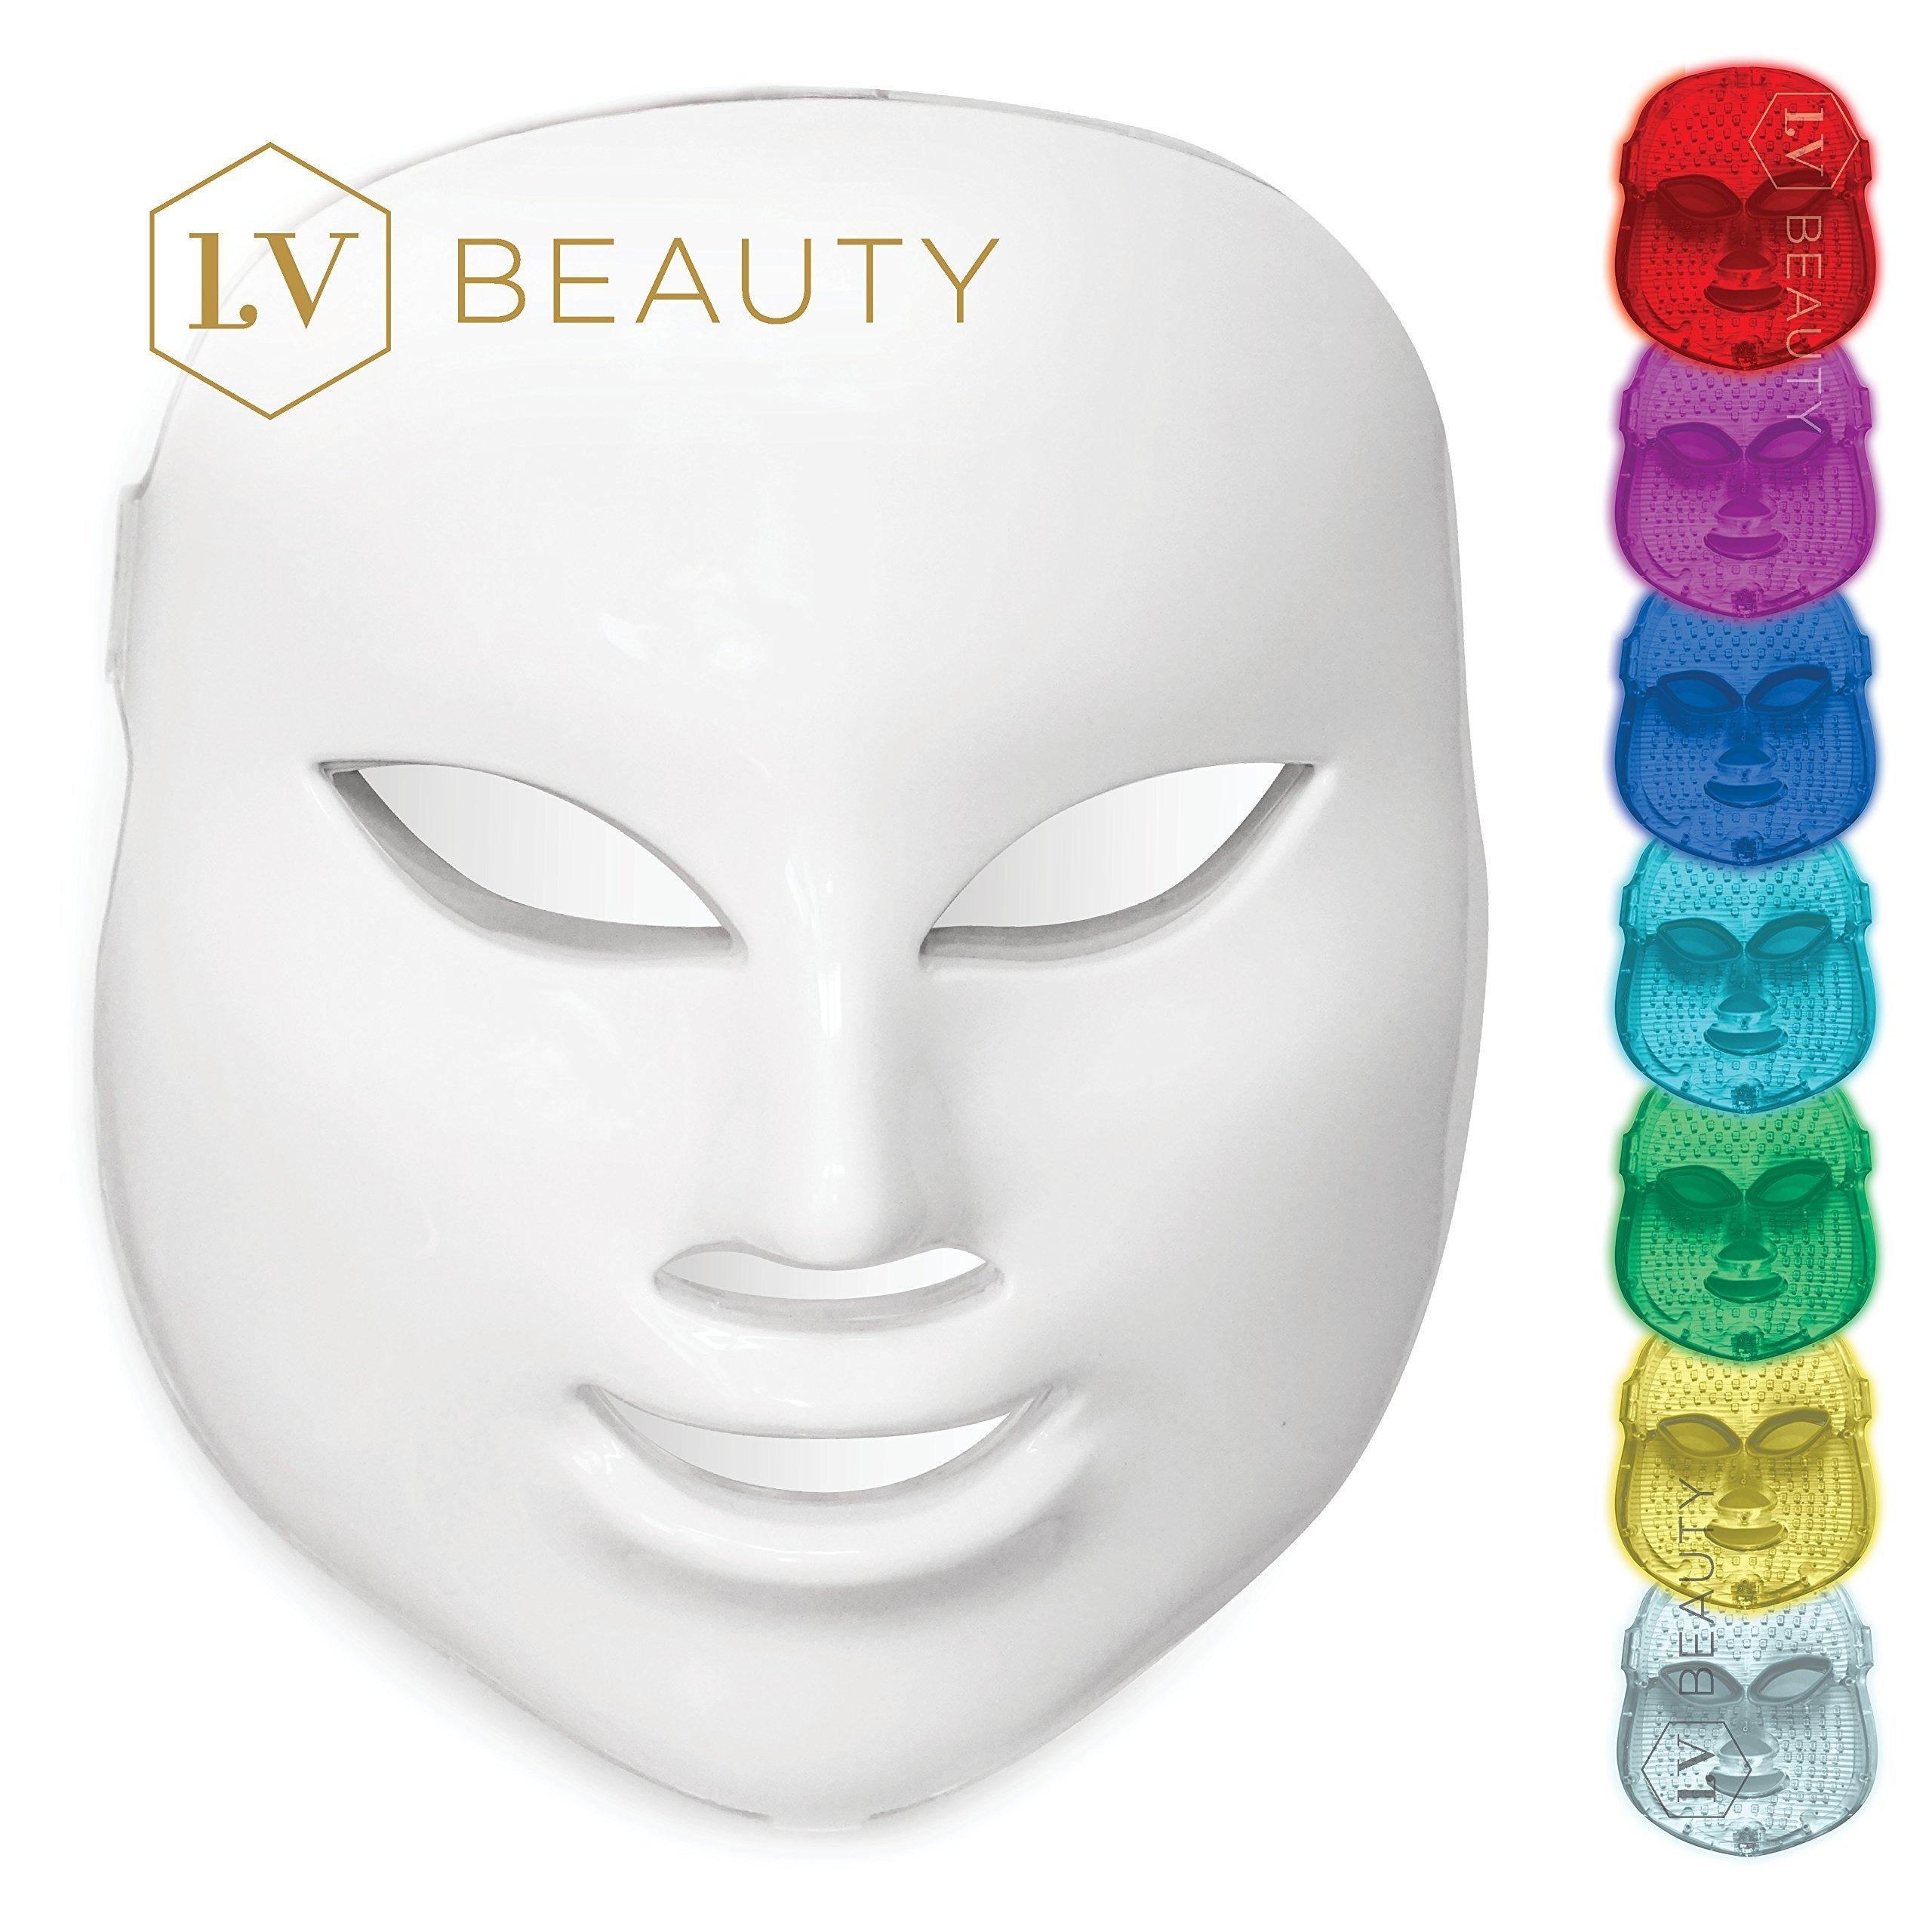 NEW LV Beauty [2018 Model] 7 Color LED Light Mask - Red Photon Light - Skin Rejuvenation - Facial Treatment - Reduce Acne - Tighten Lines - Replenish Collagen - Fight Wrinkles - Shrink Pores